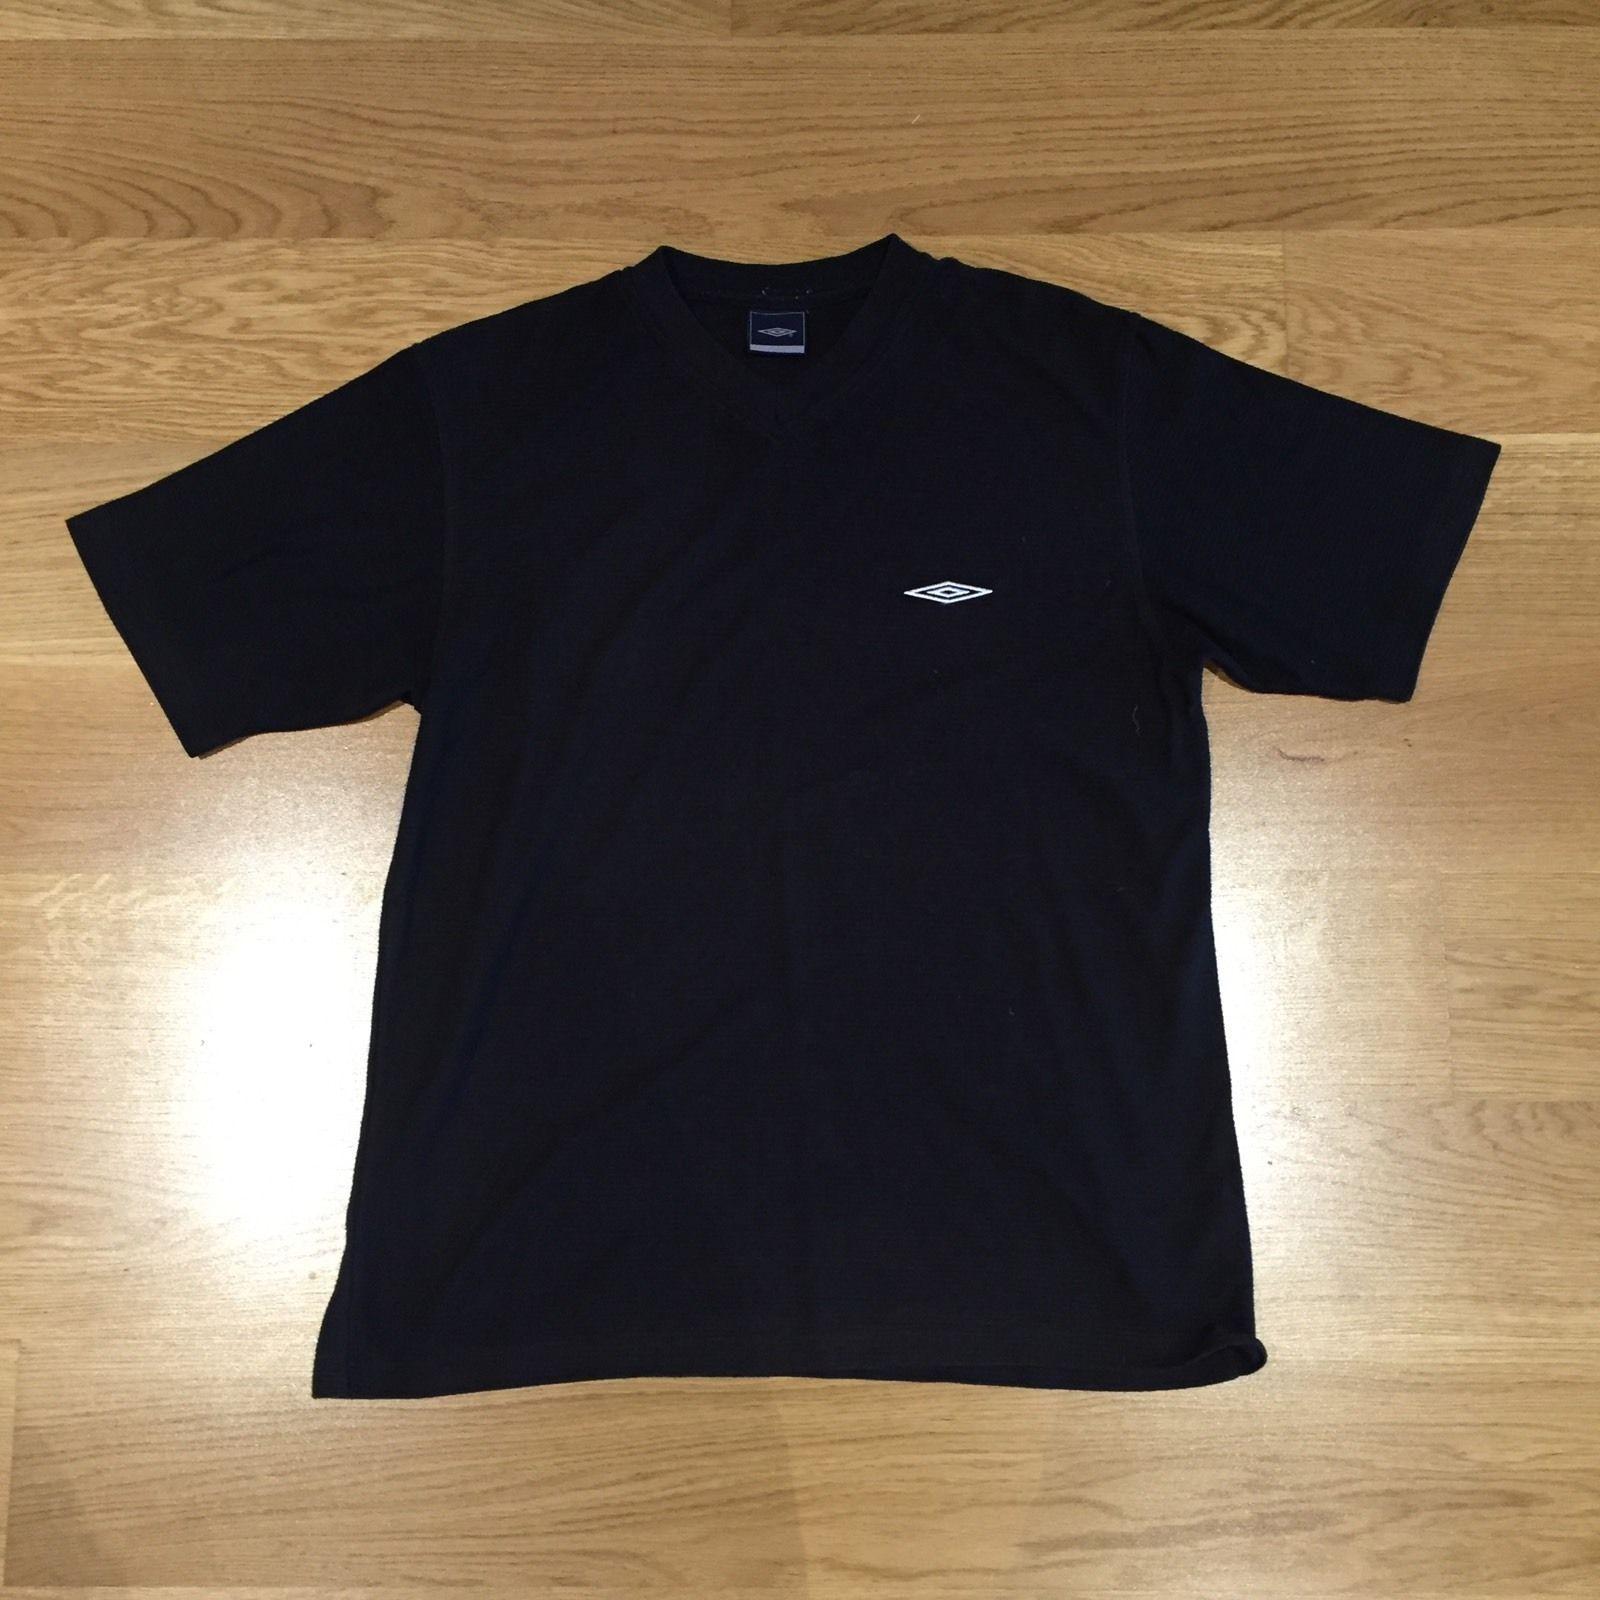 Black umbro t shirt - Umbro V Neck Short Sleeve T Shirt Textured Stripe Black Size Xl Ebay